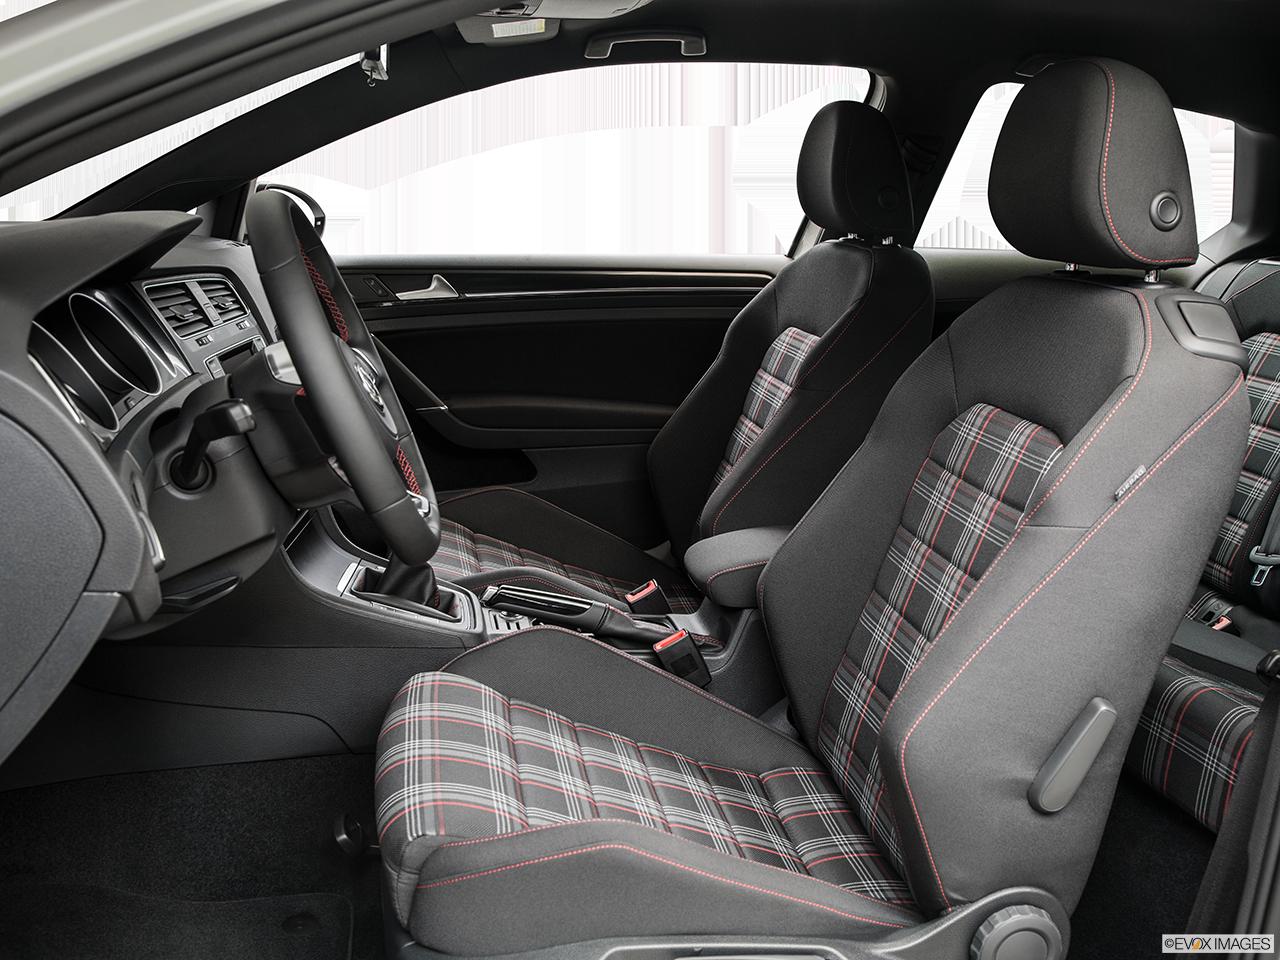 Research The 2015 Volkswagen Golf GTI in Franklin